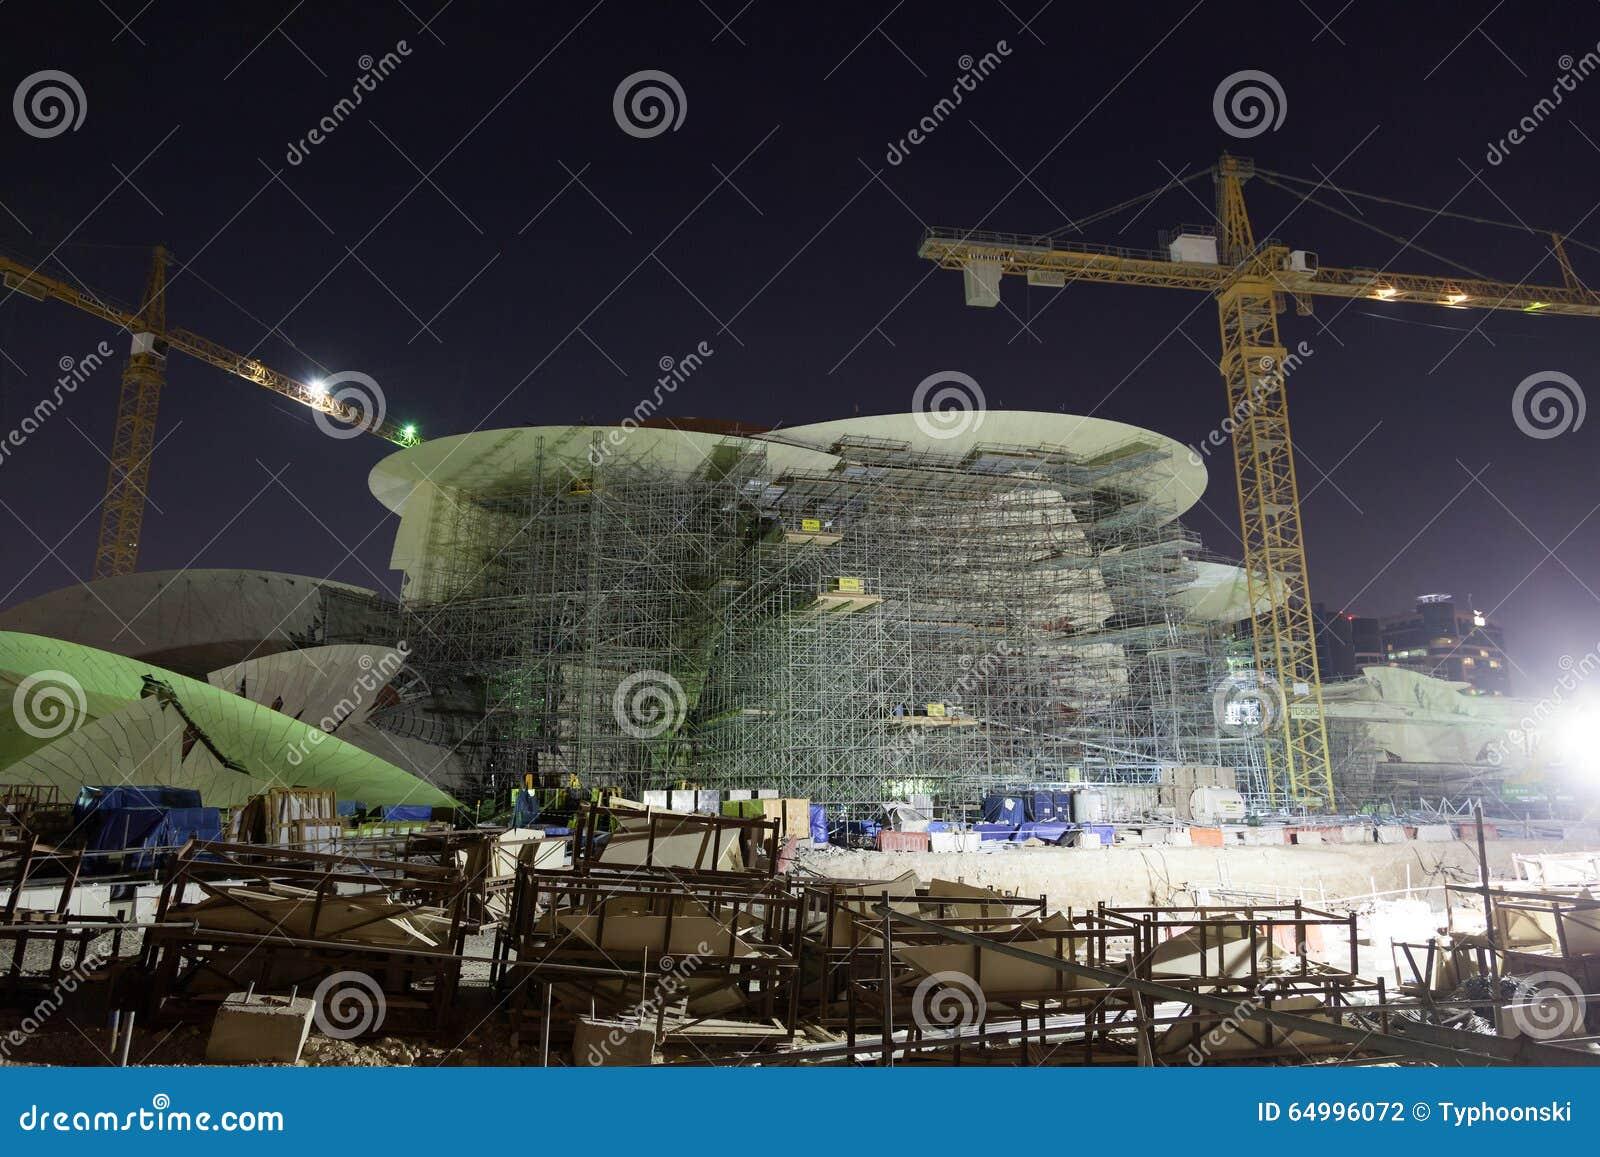 Qatar National Museum Construction Site Editorial